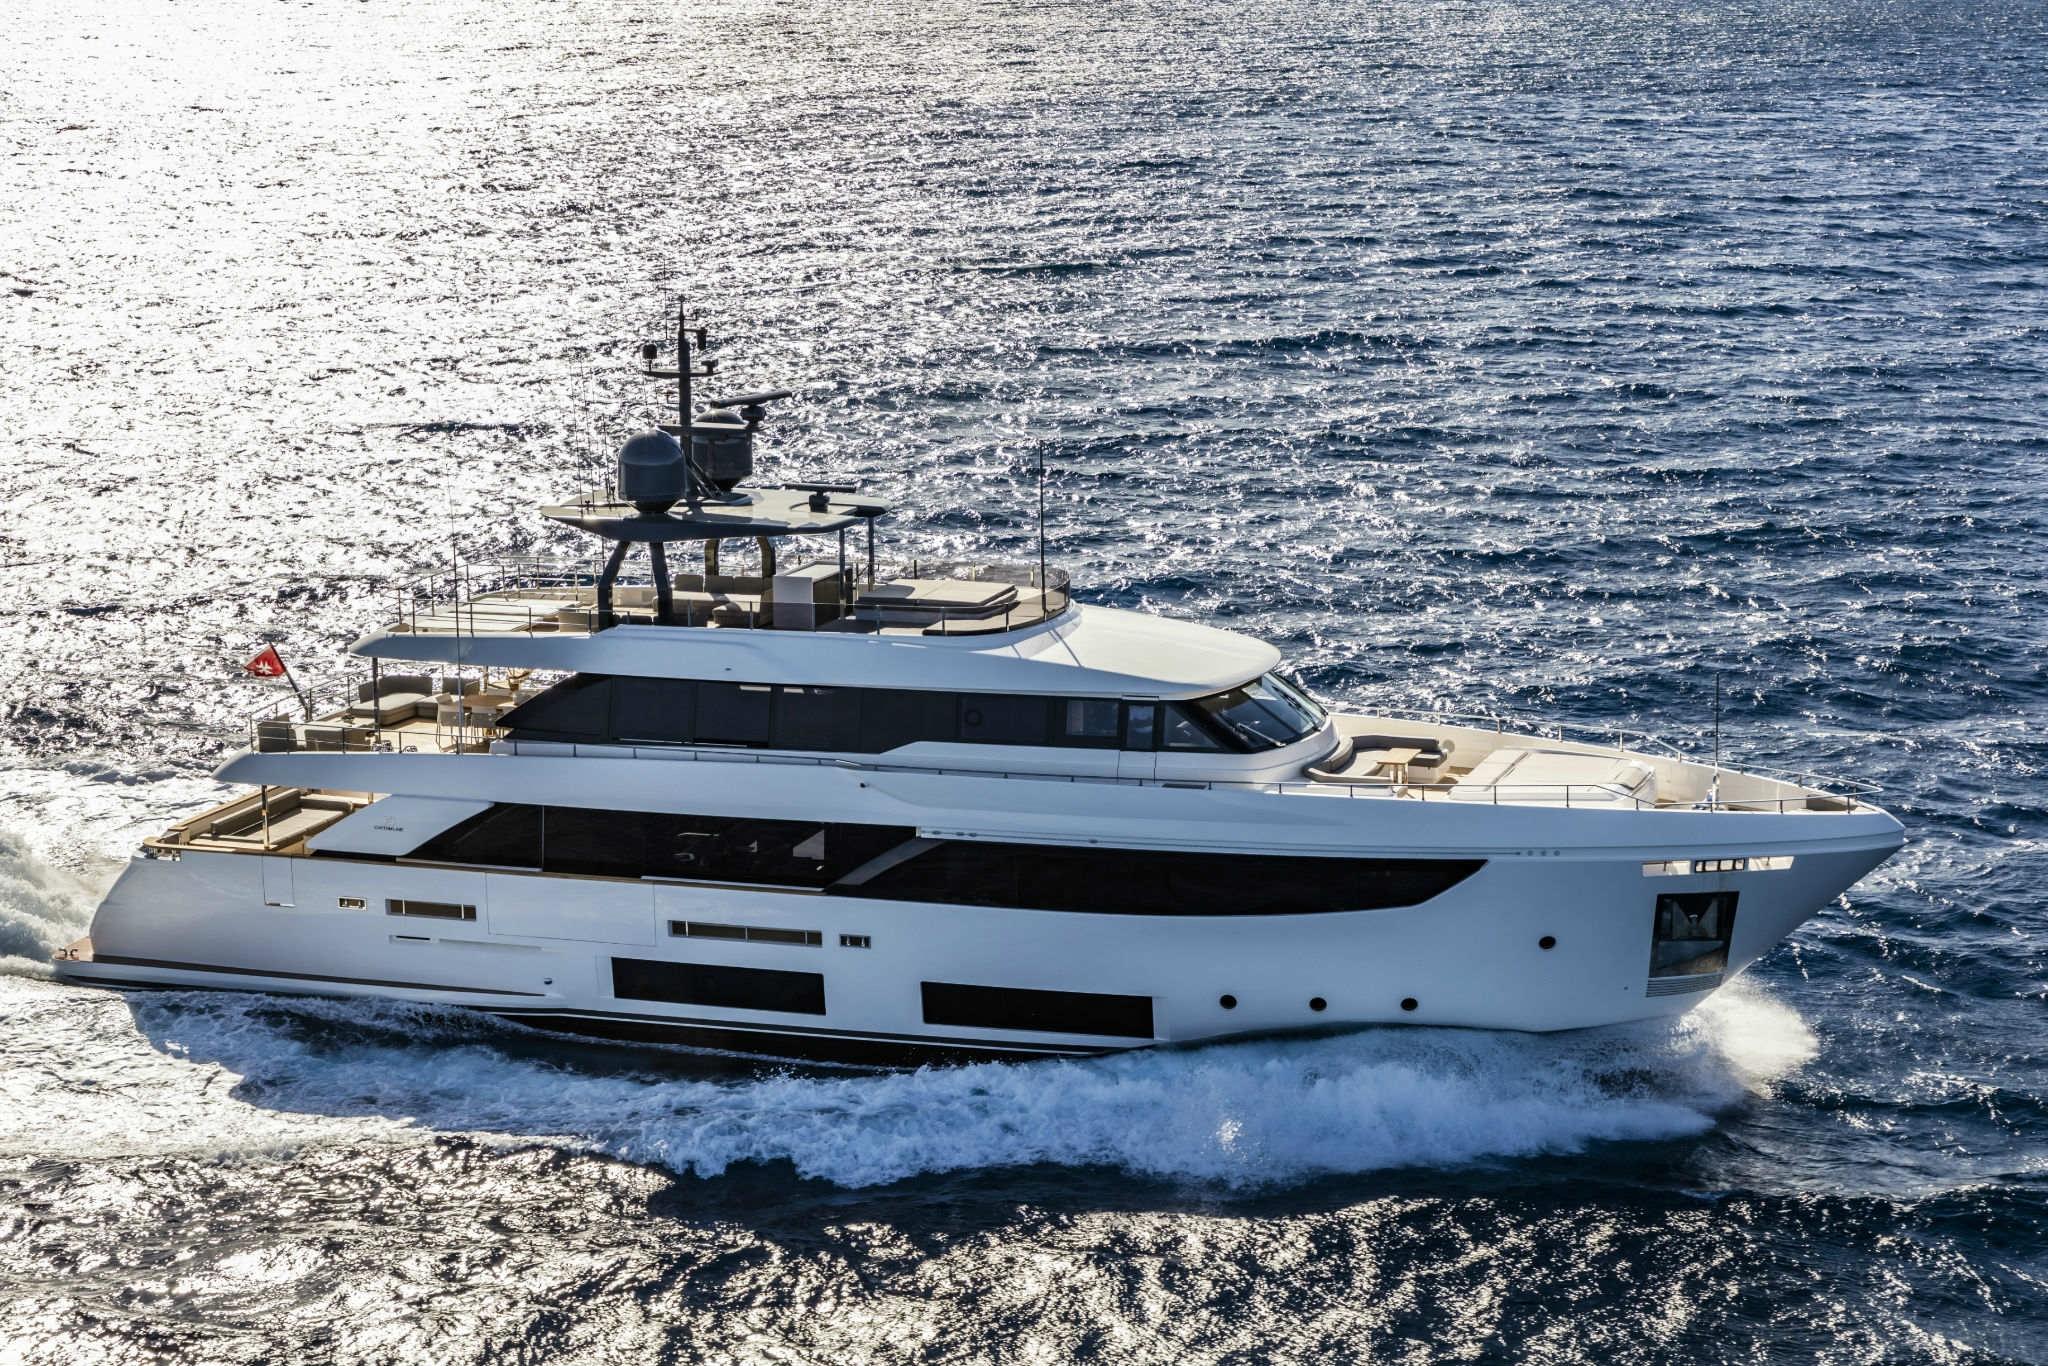 Navetta 33 motor yacht - sistership to Mirabilis